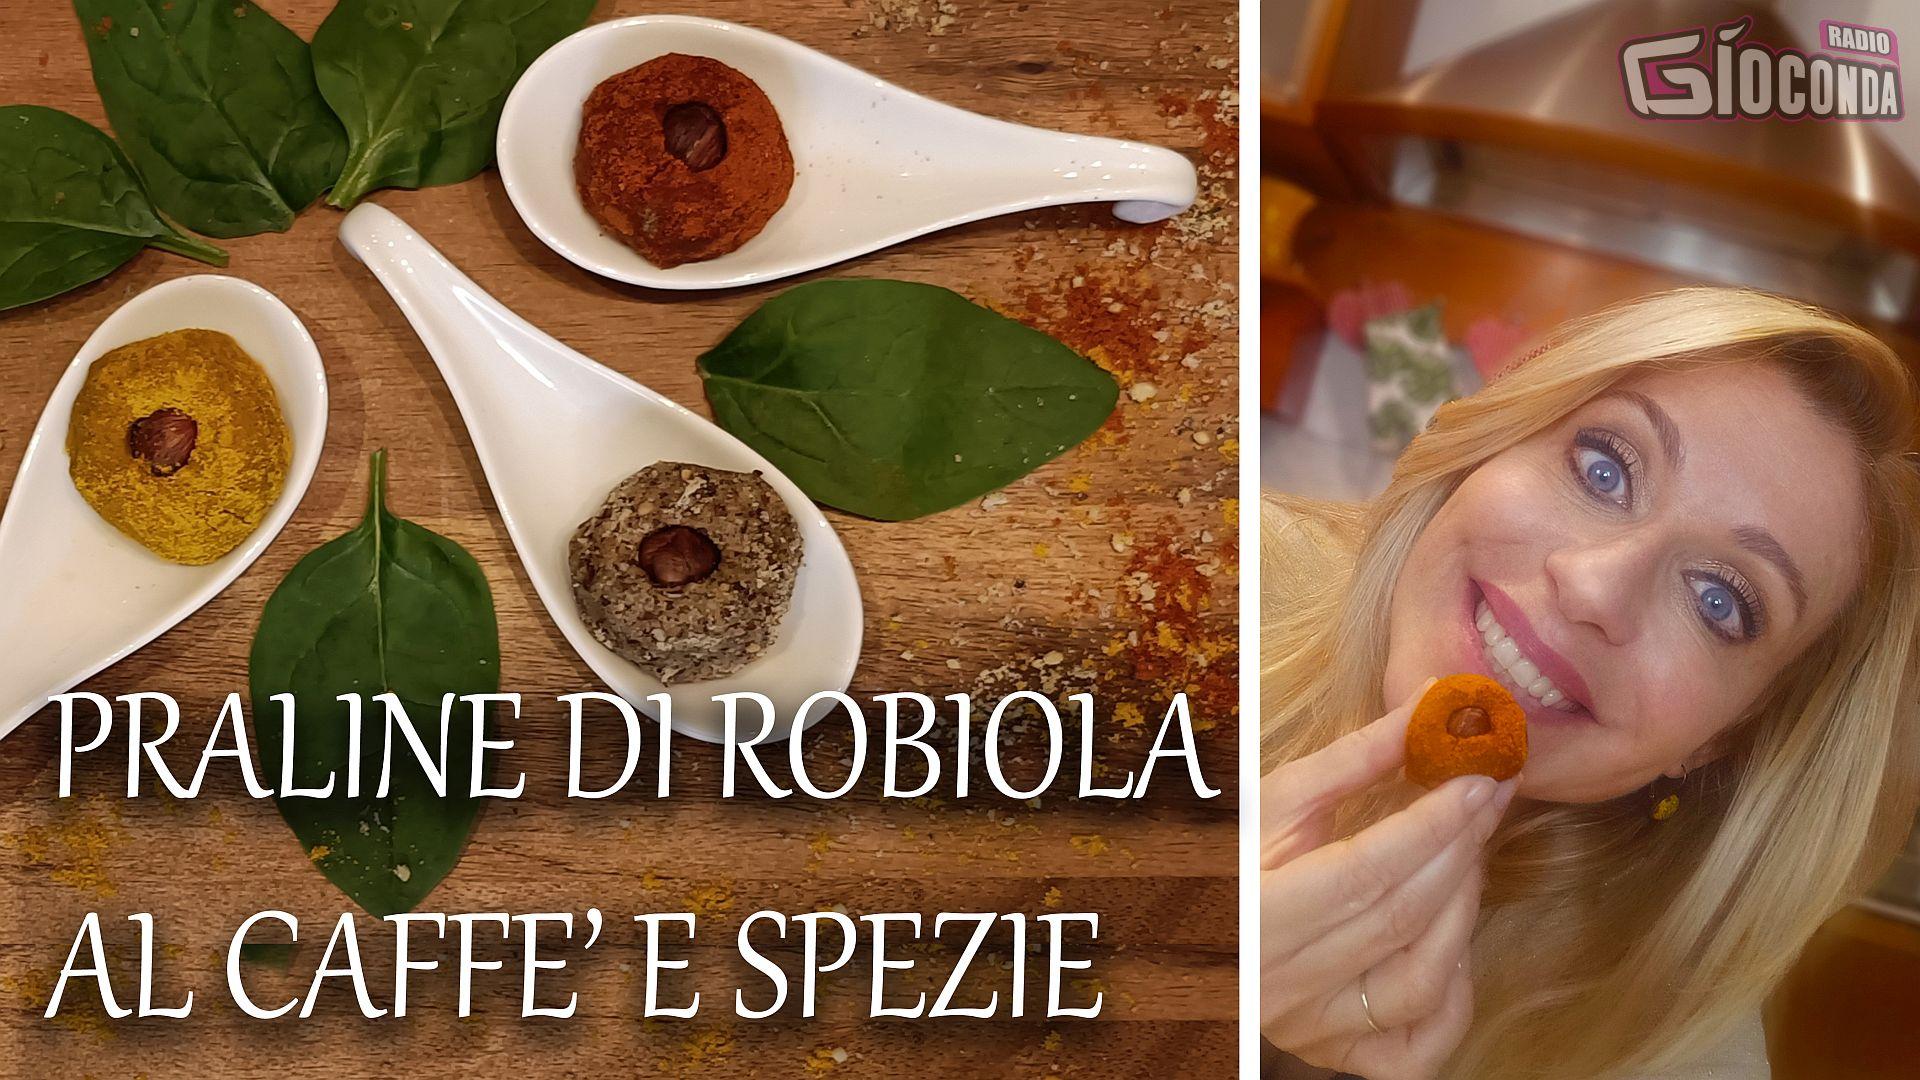 Praline di Robiola al Caffè e Spezie